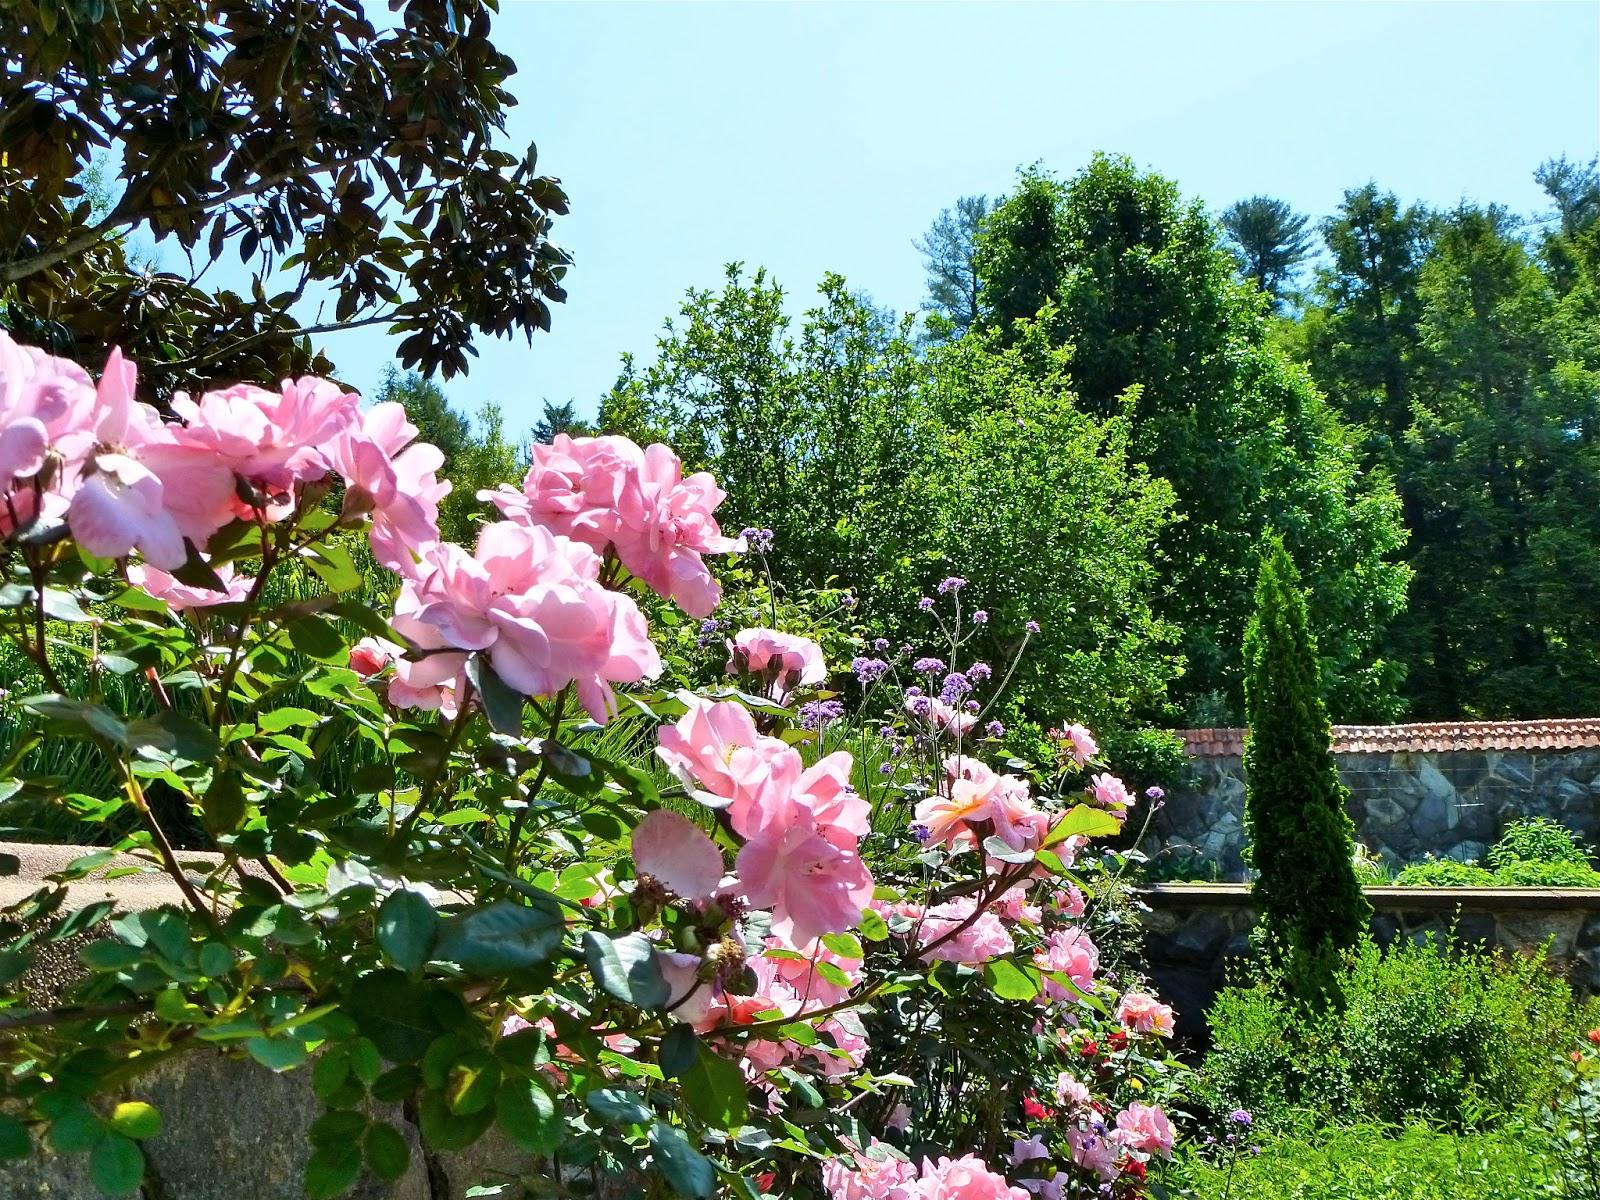 Backyard rose garden - Backyard Rose Garden